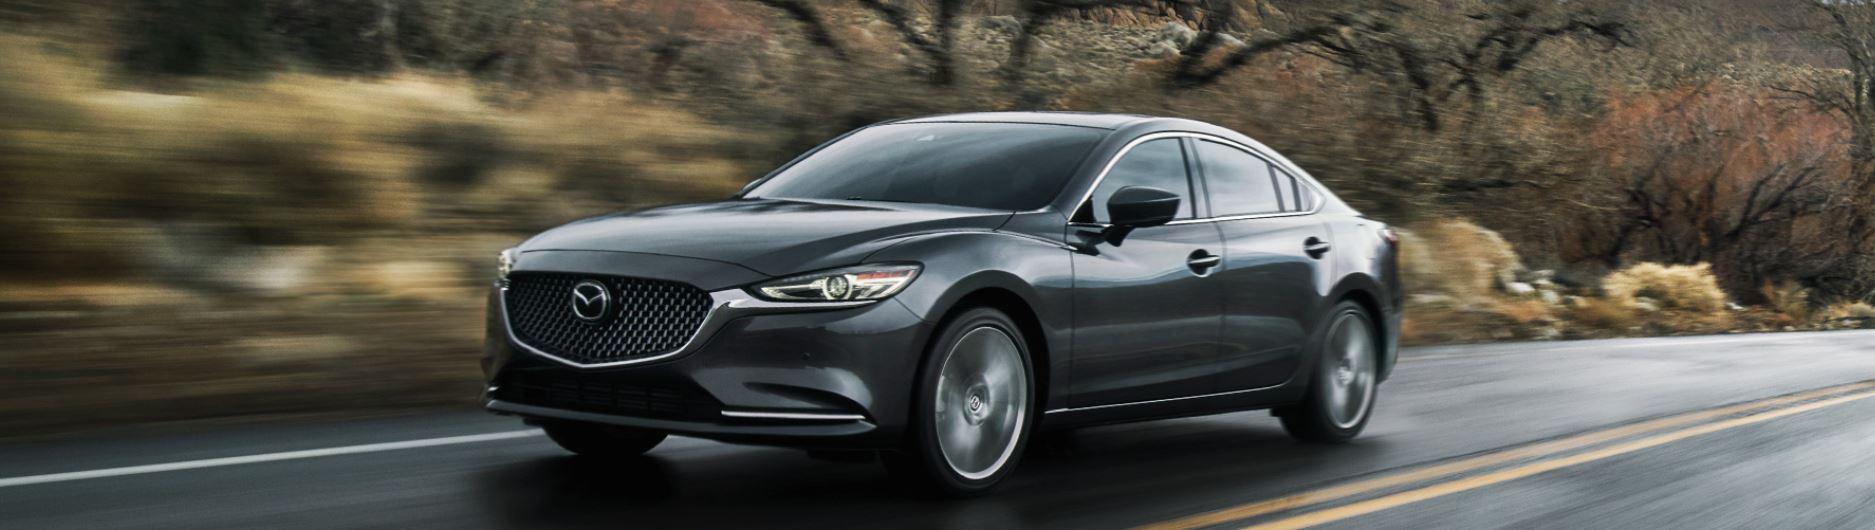 2019 Mazda6 Leasing near Potomac, MD